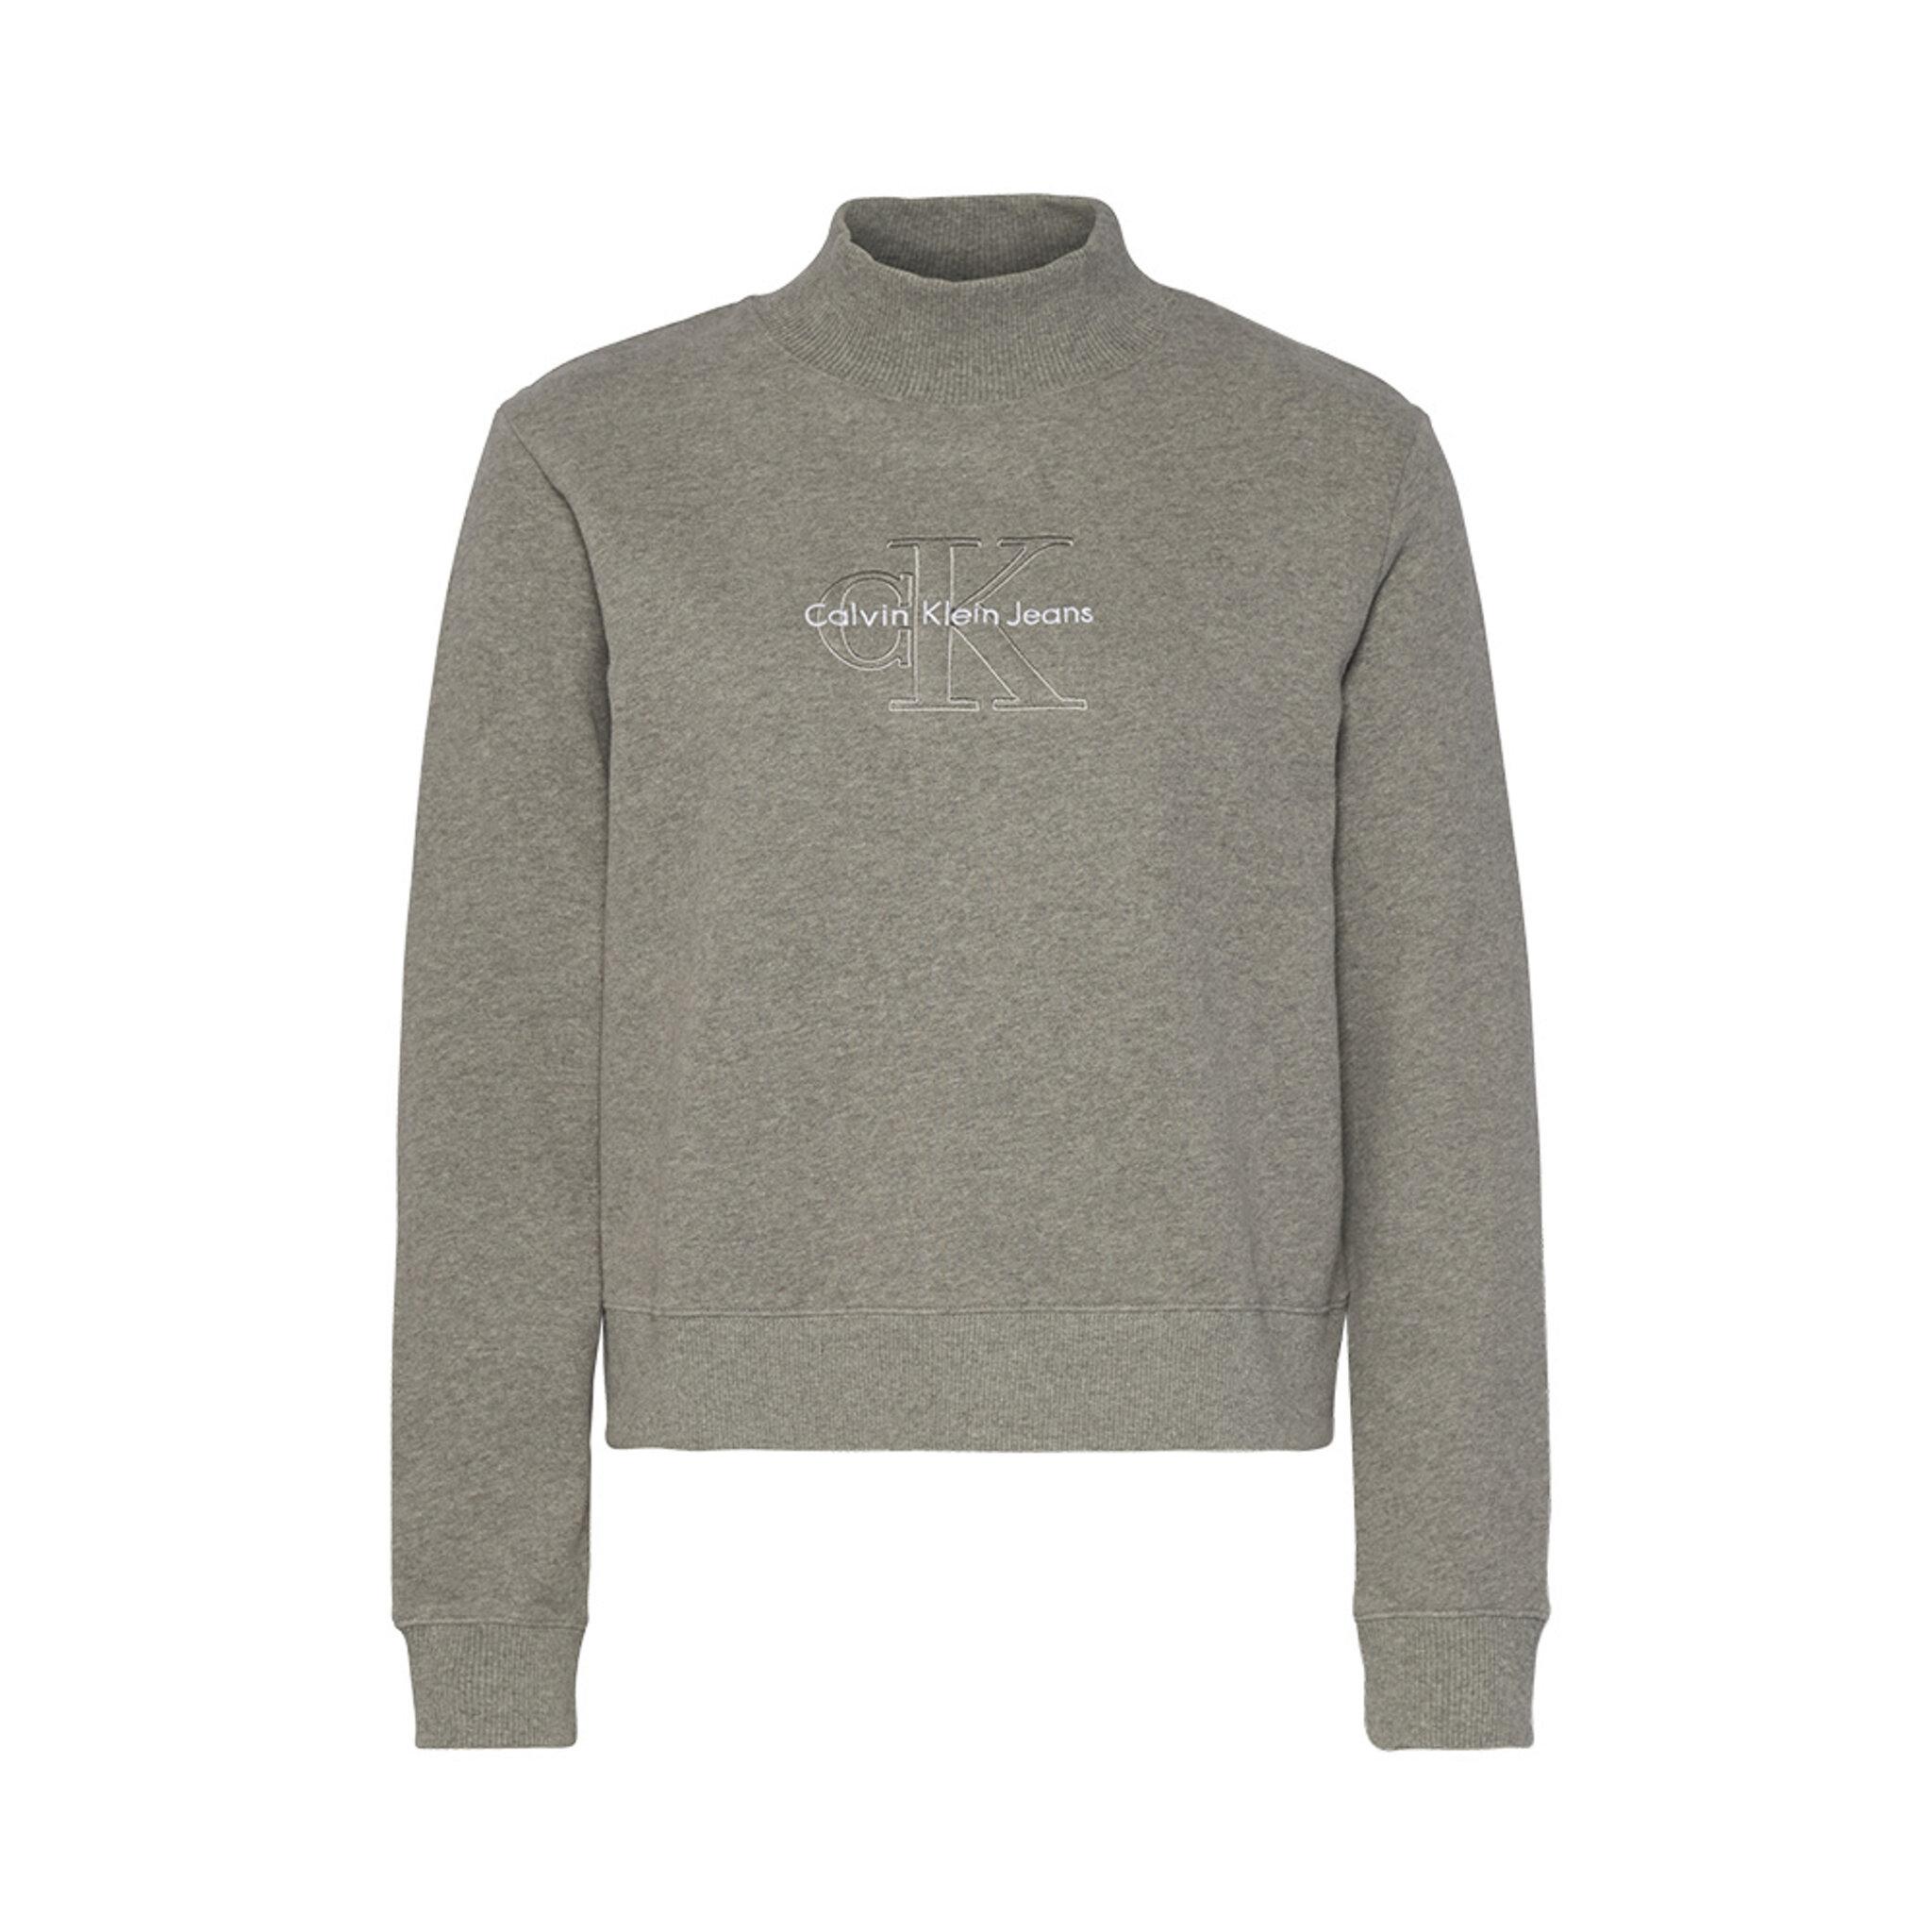 Sweatshirt Hazel True Icon, grey